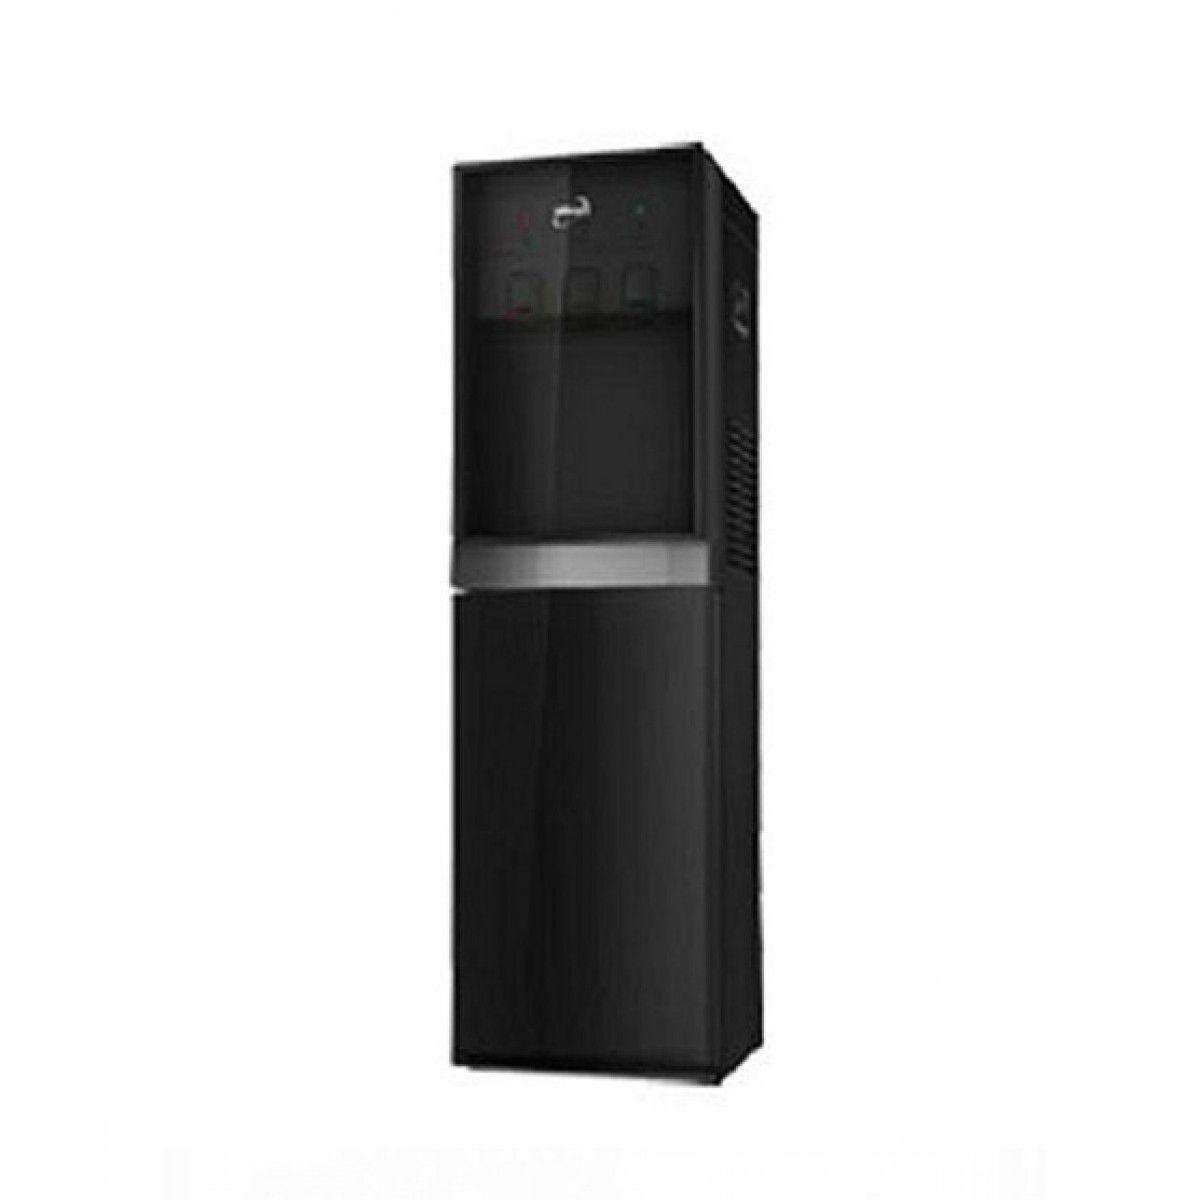 Homage 2 Taps HWD-67 Water Dispenser